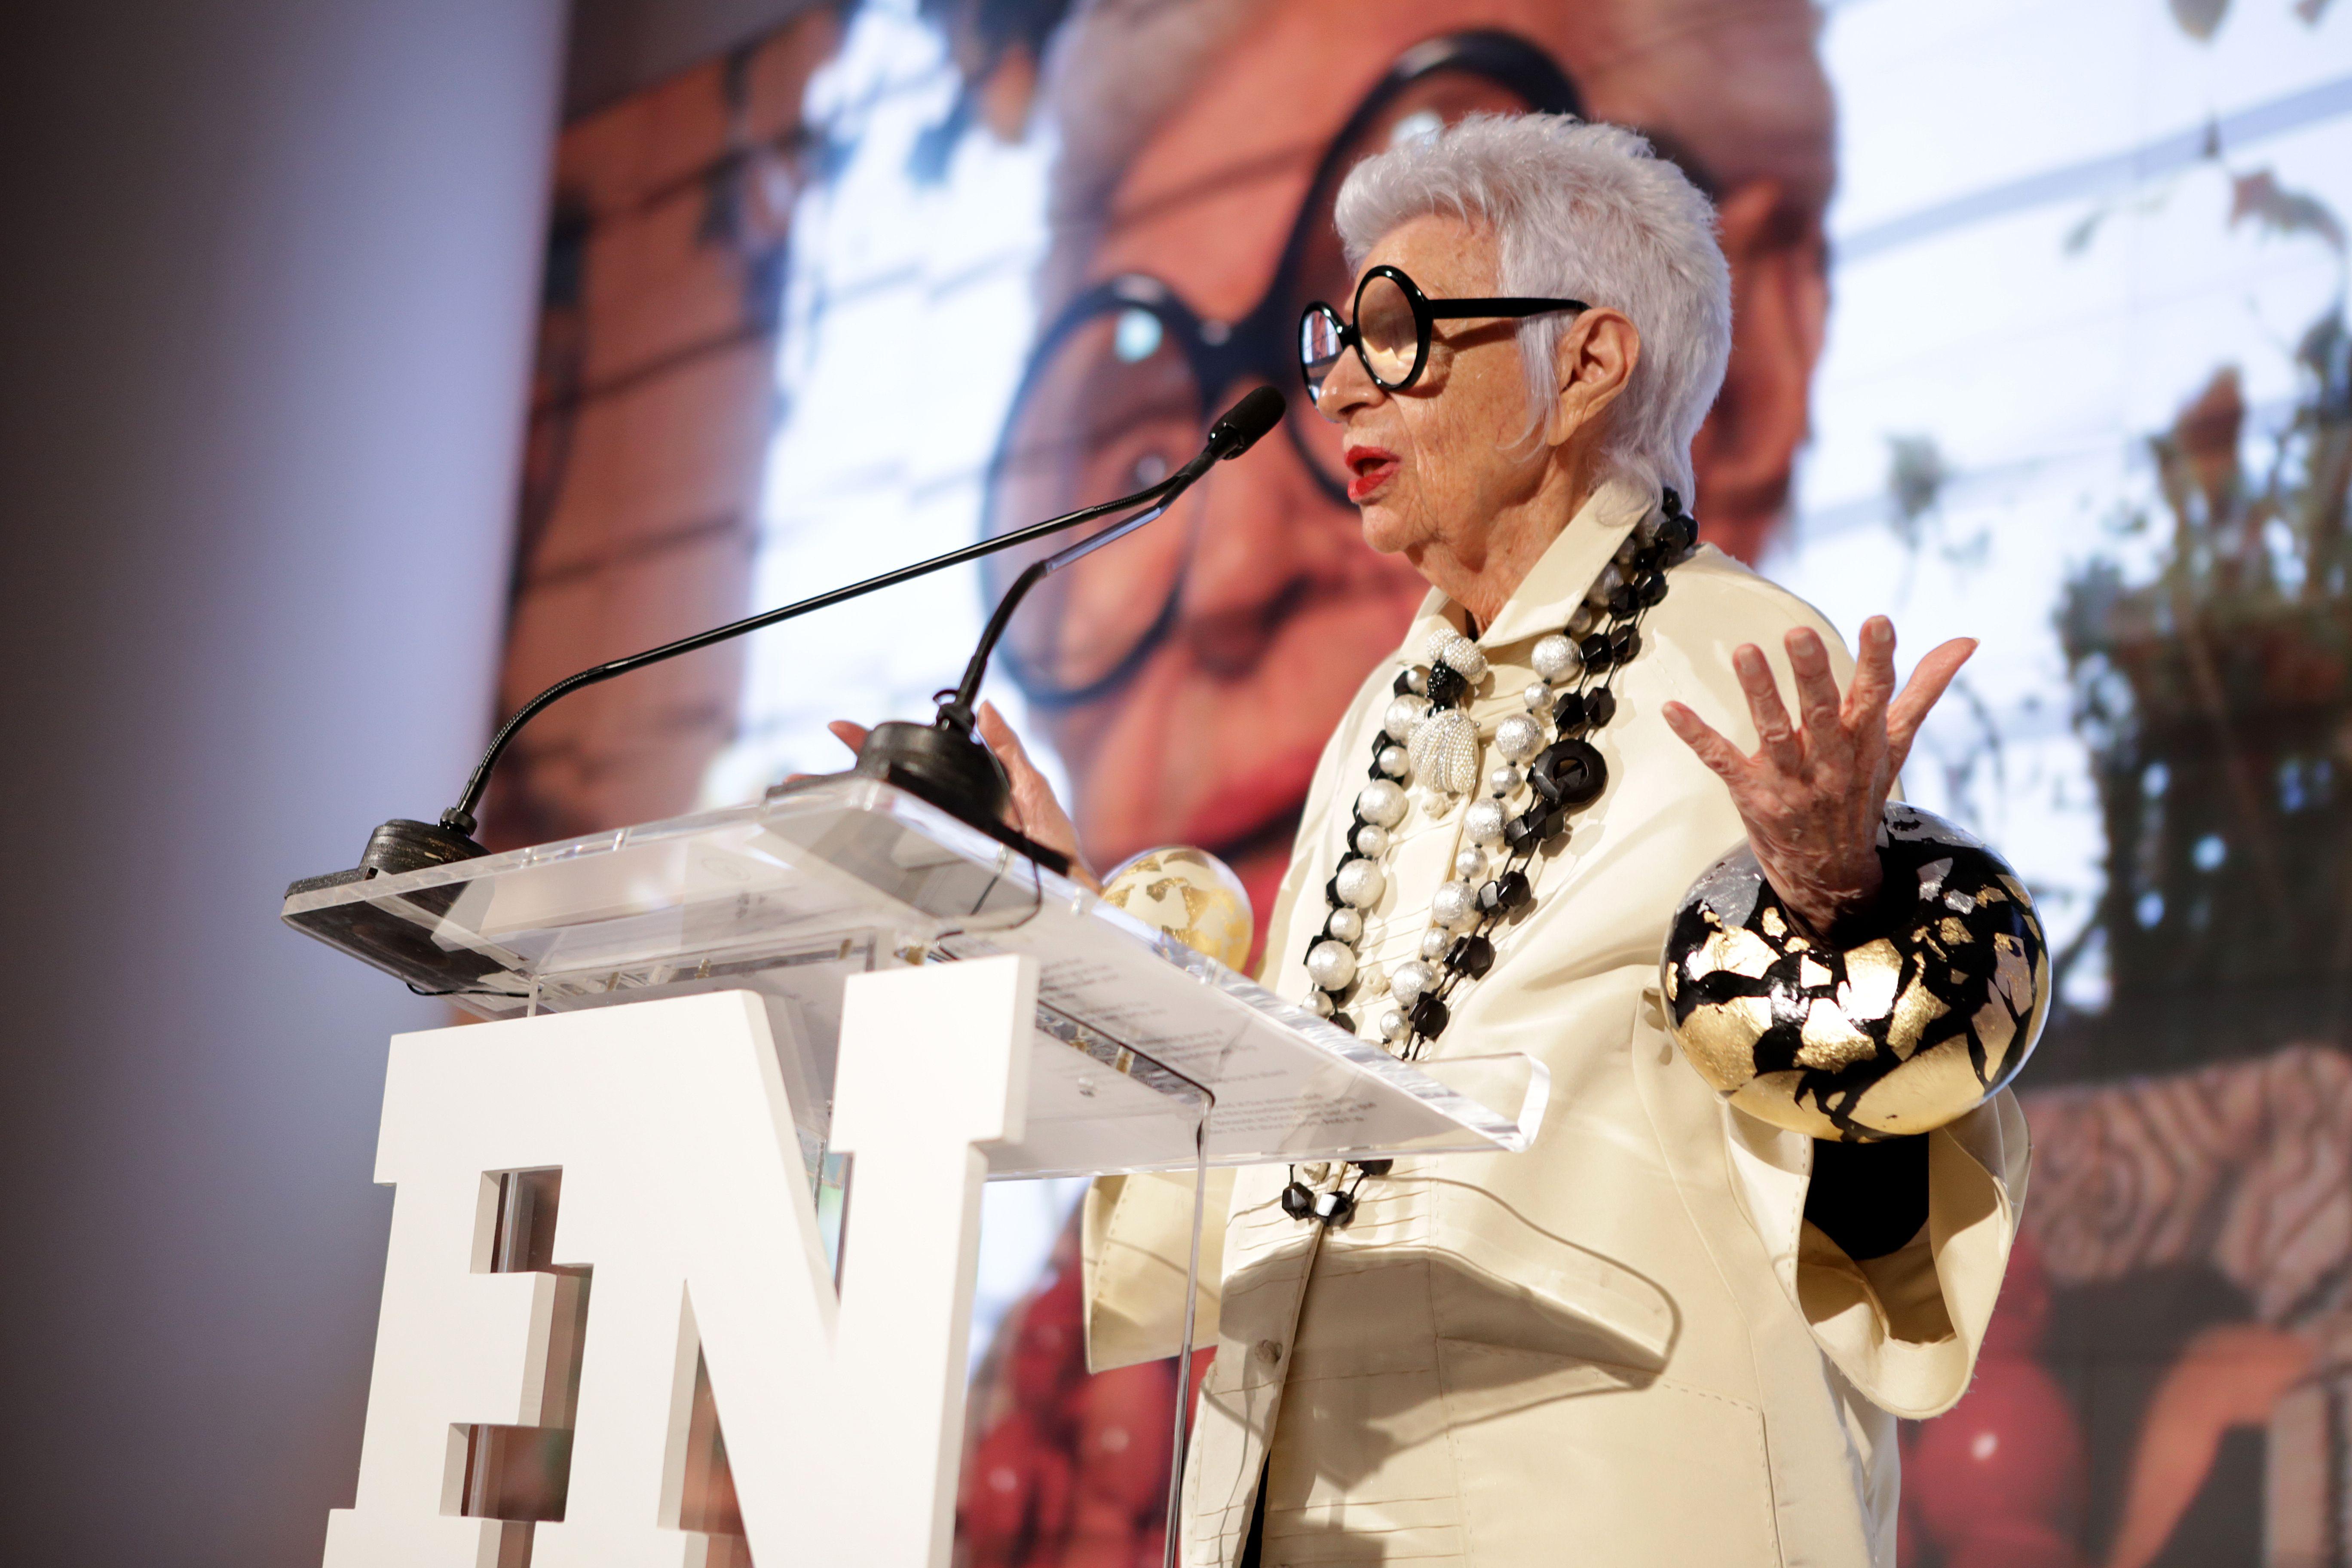 Iris Apfel holder foredrag i 2016 (Foto: All Over)